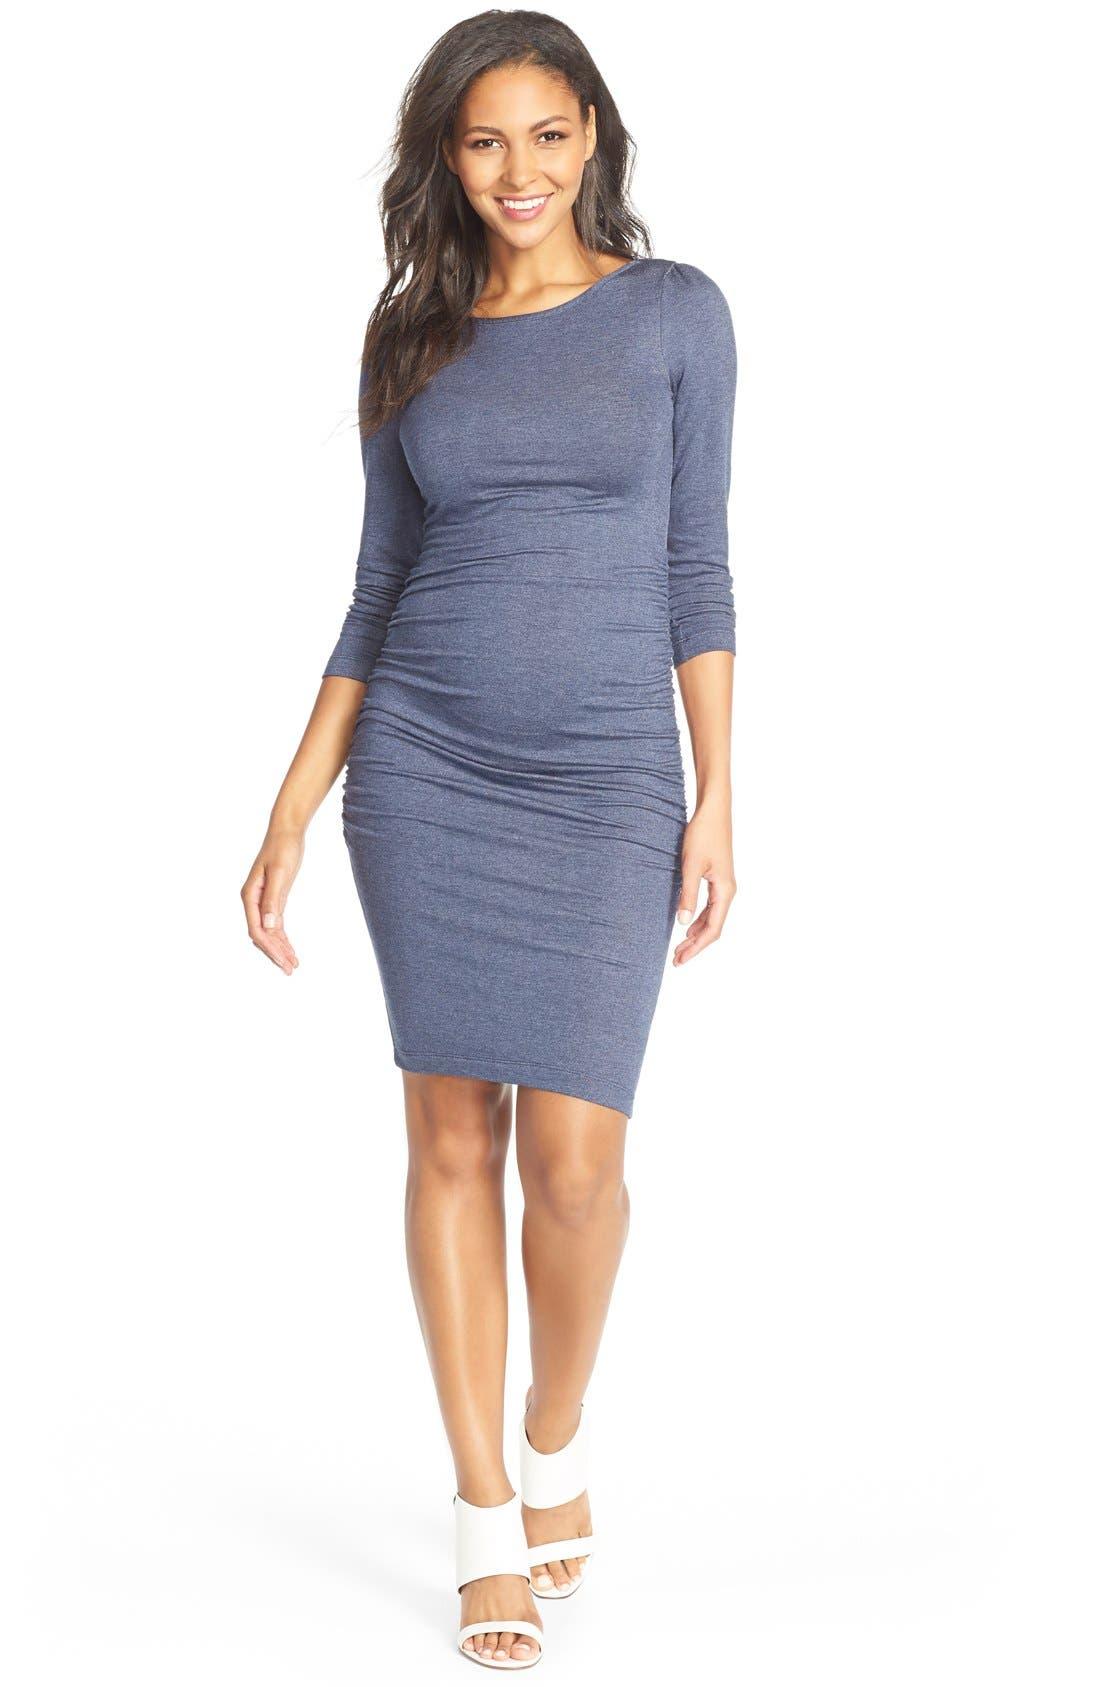 Presley Body-Con Maternity Dress,                         Main,                         color, Blue Denim